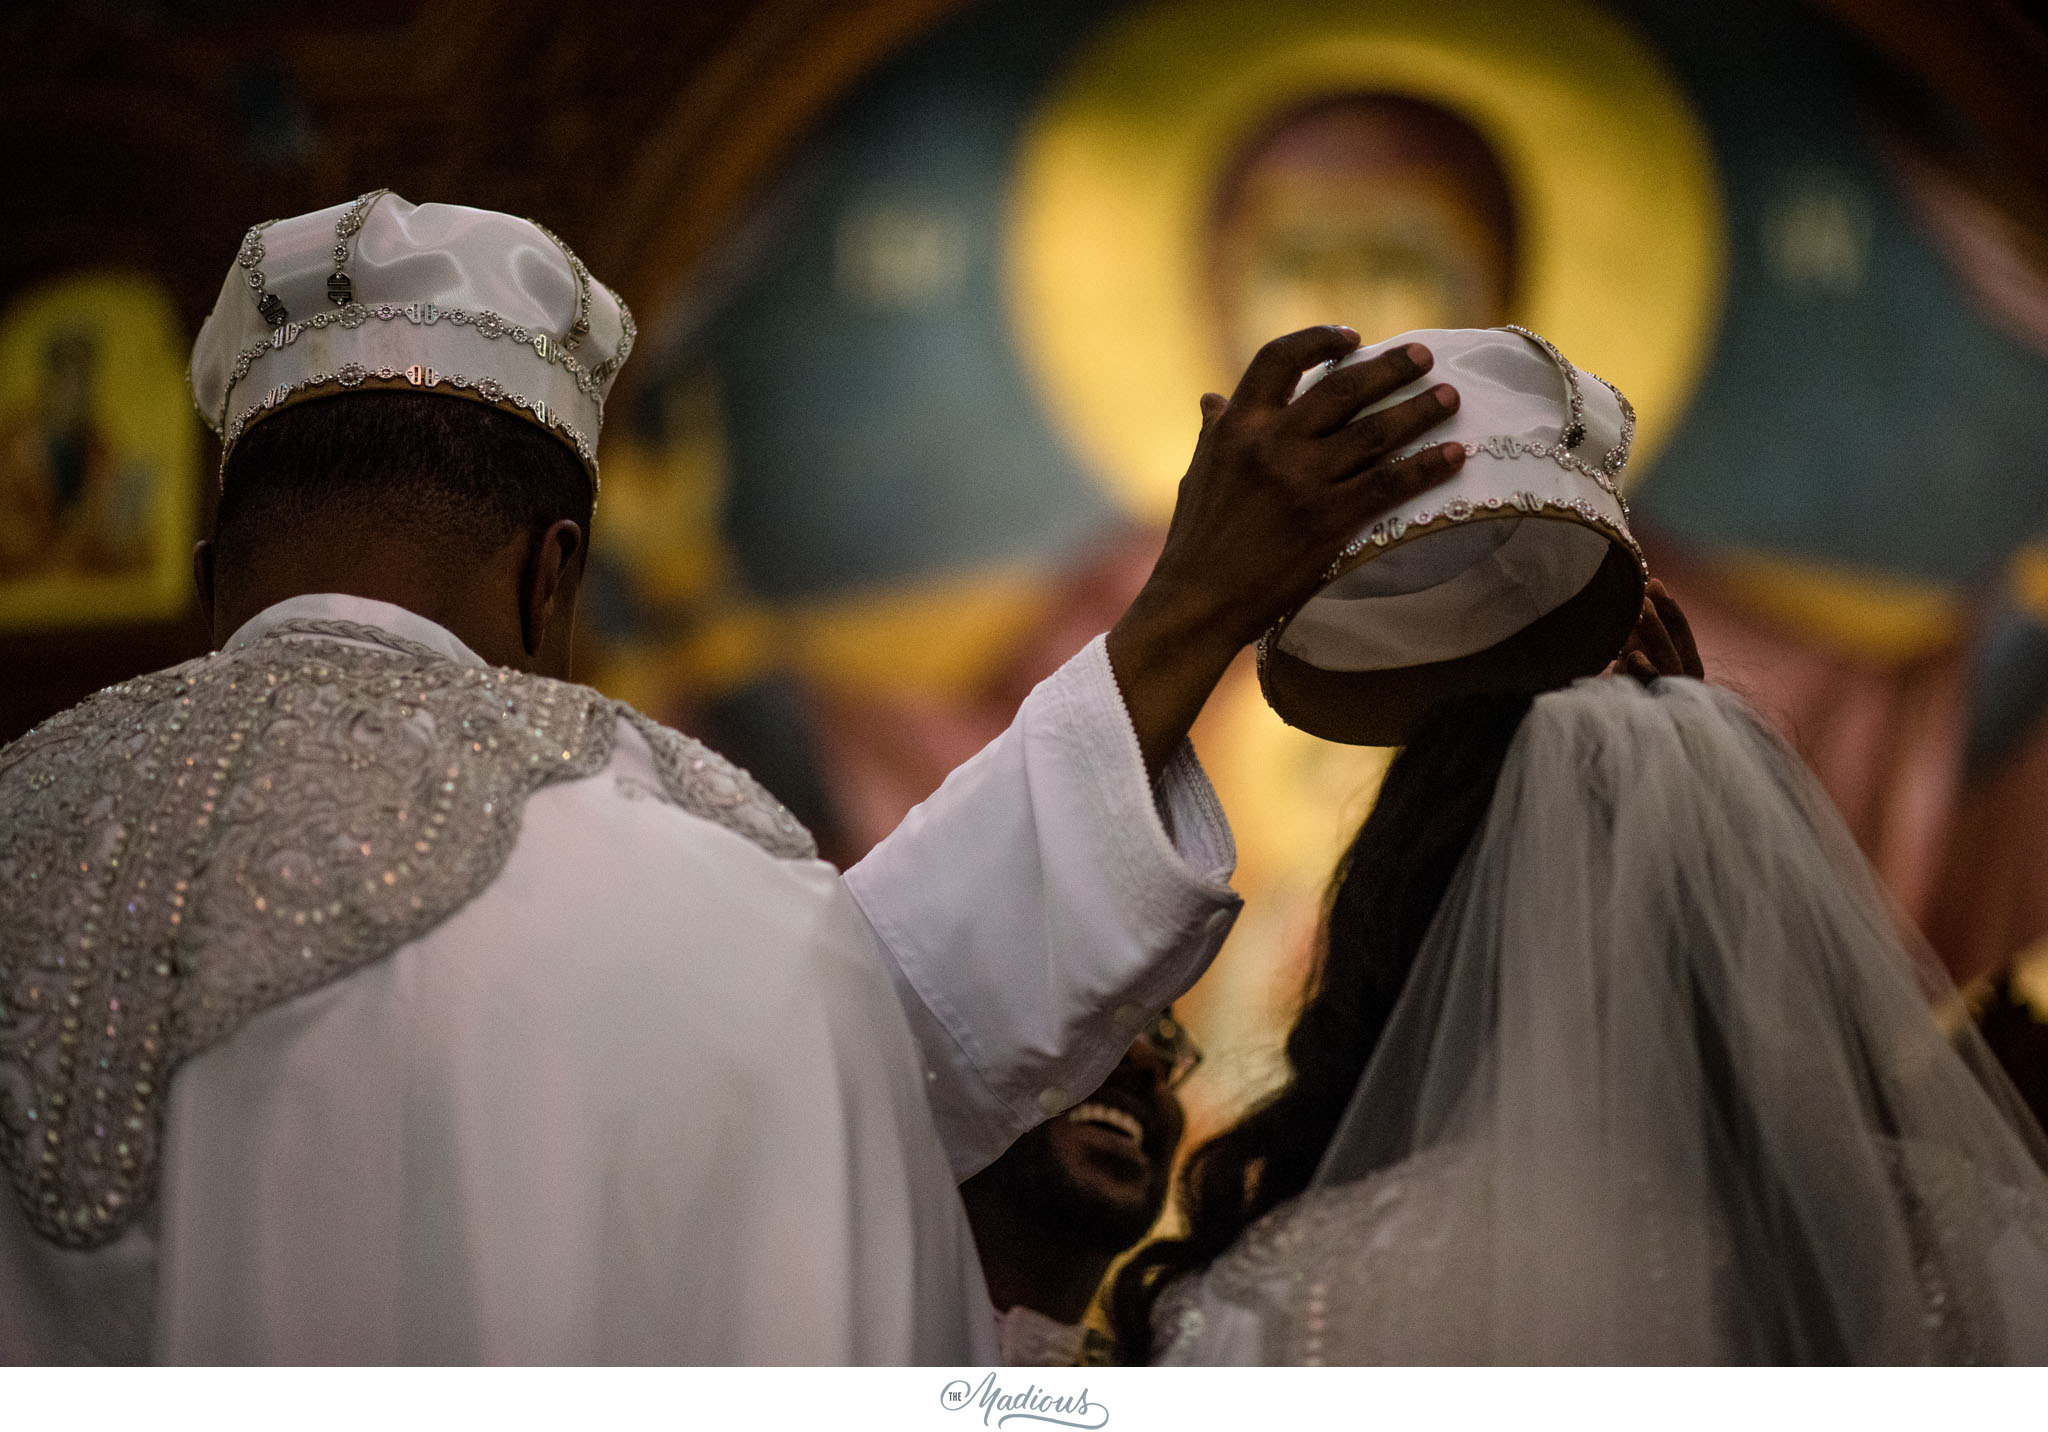 nmwa+wedding,+women+in+the+arts+wedding,+ethiopian+wedding,+dc+wedding+0094.jpg